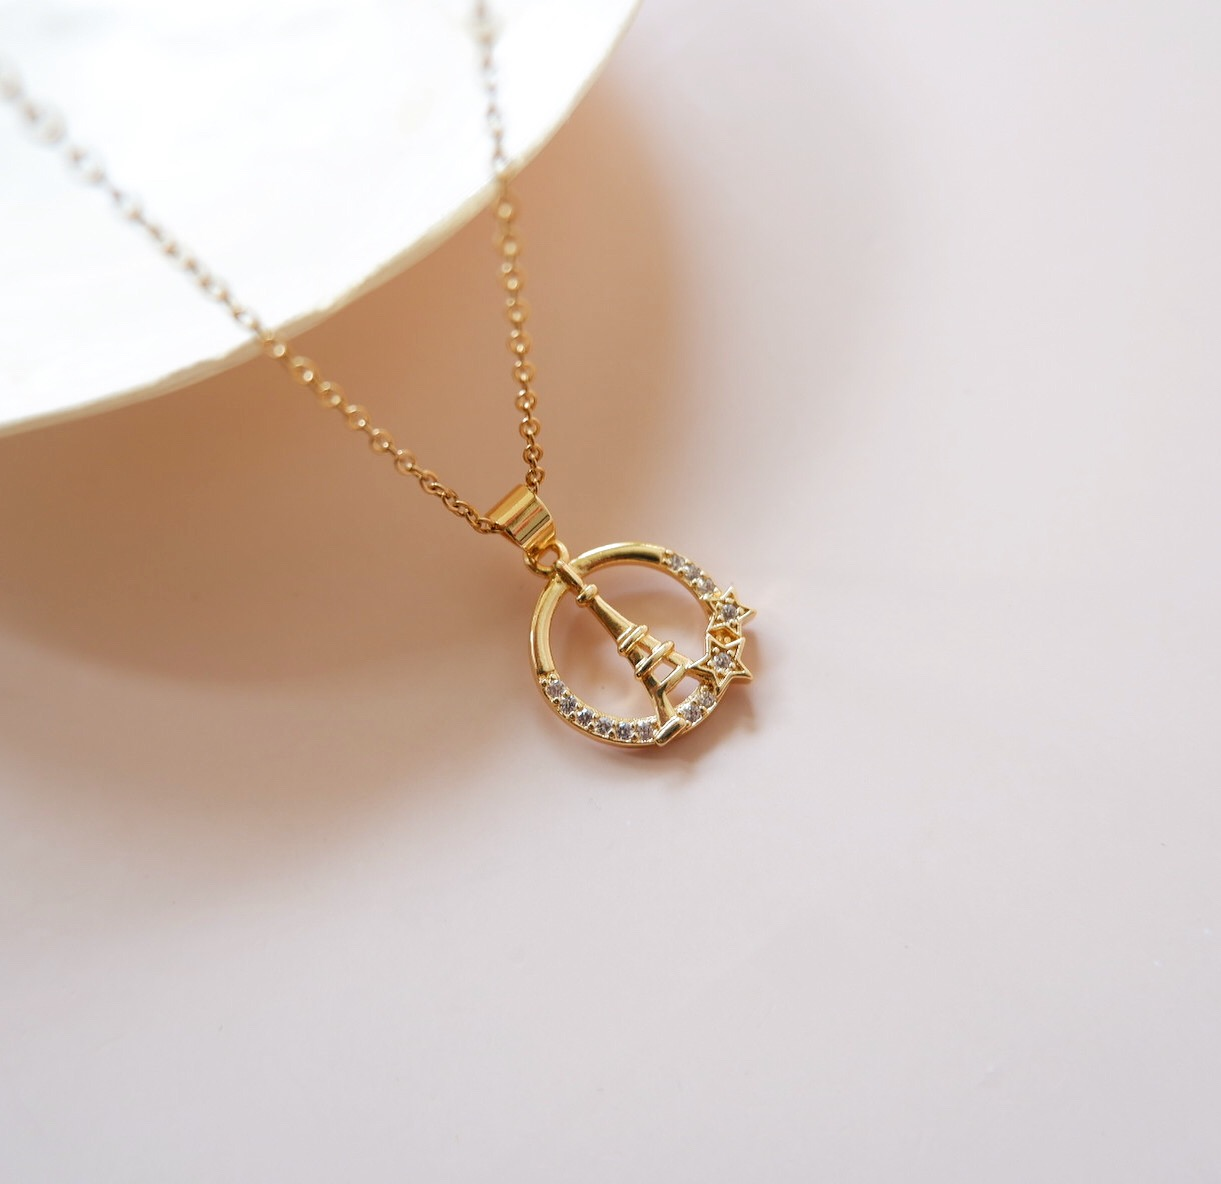 Parisian-Necklace-1.jpeg